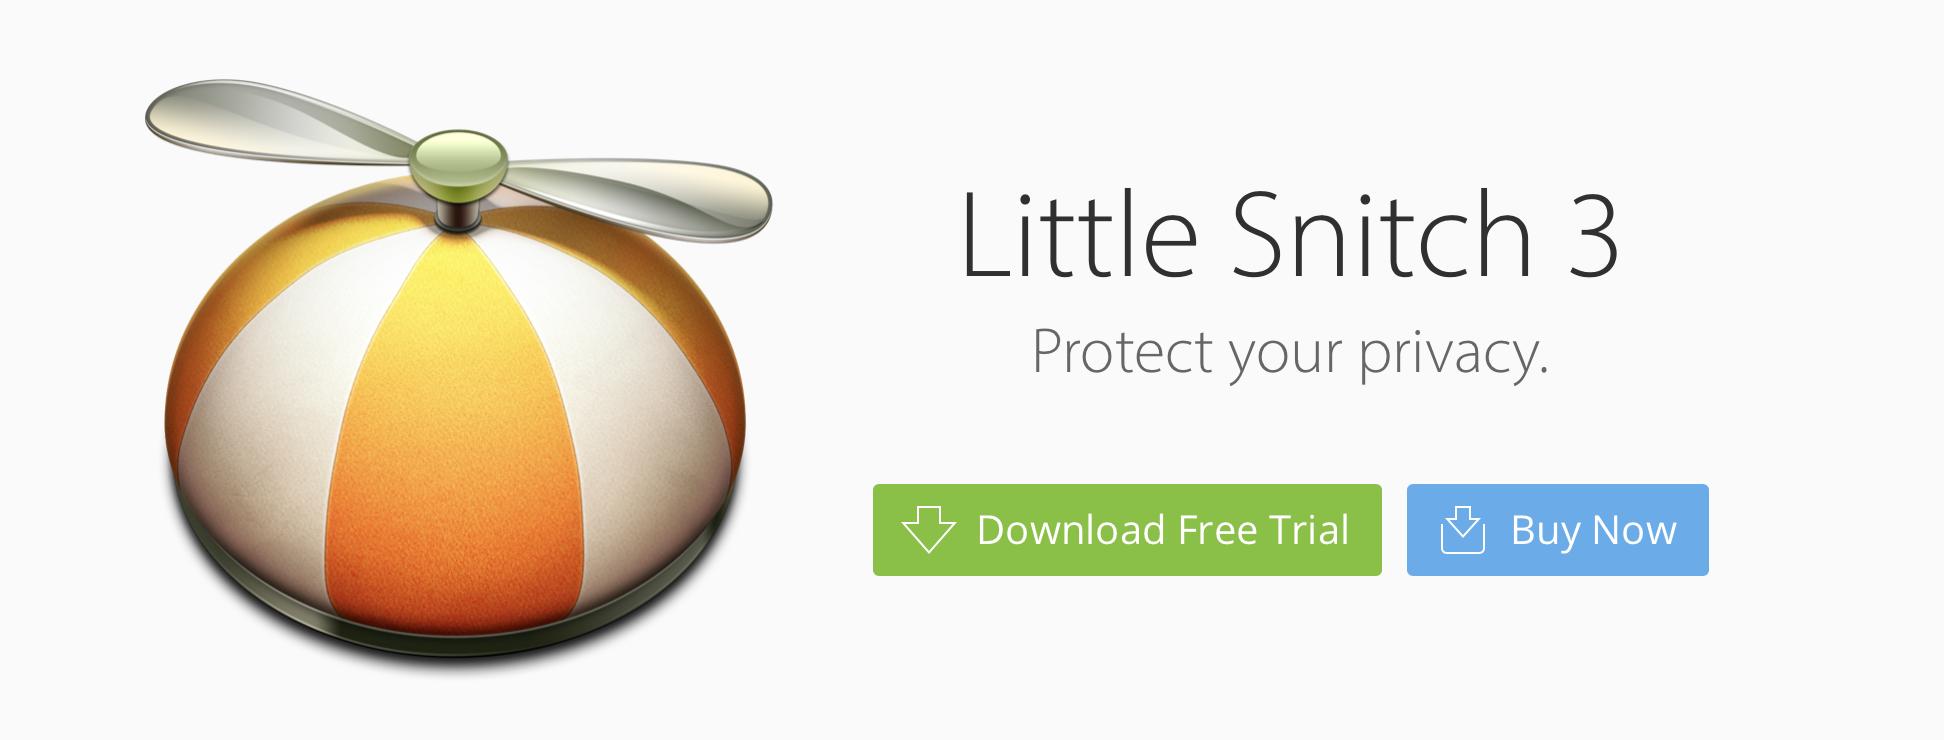 little snitch like free